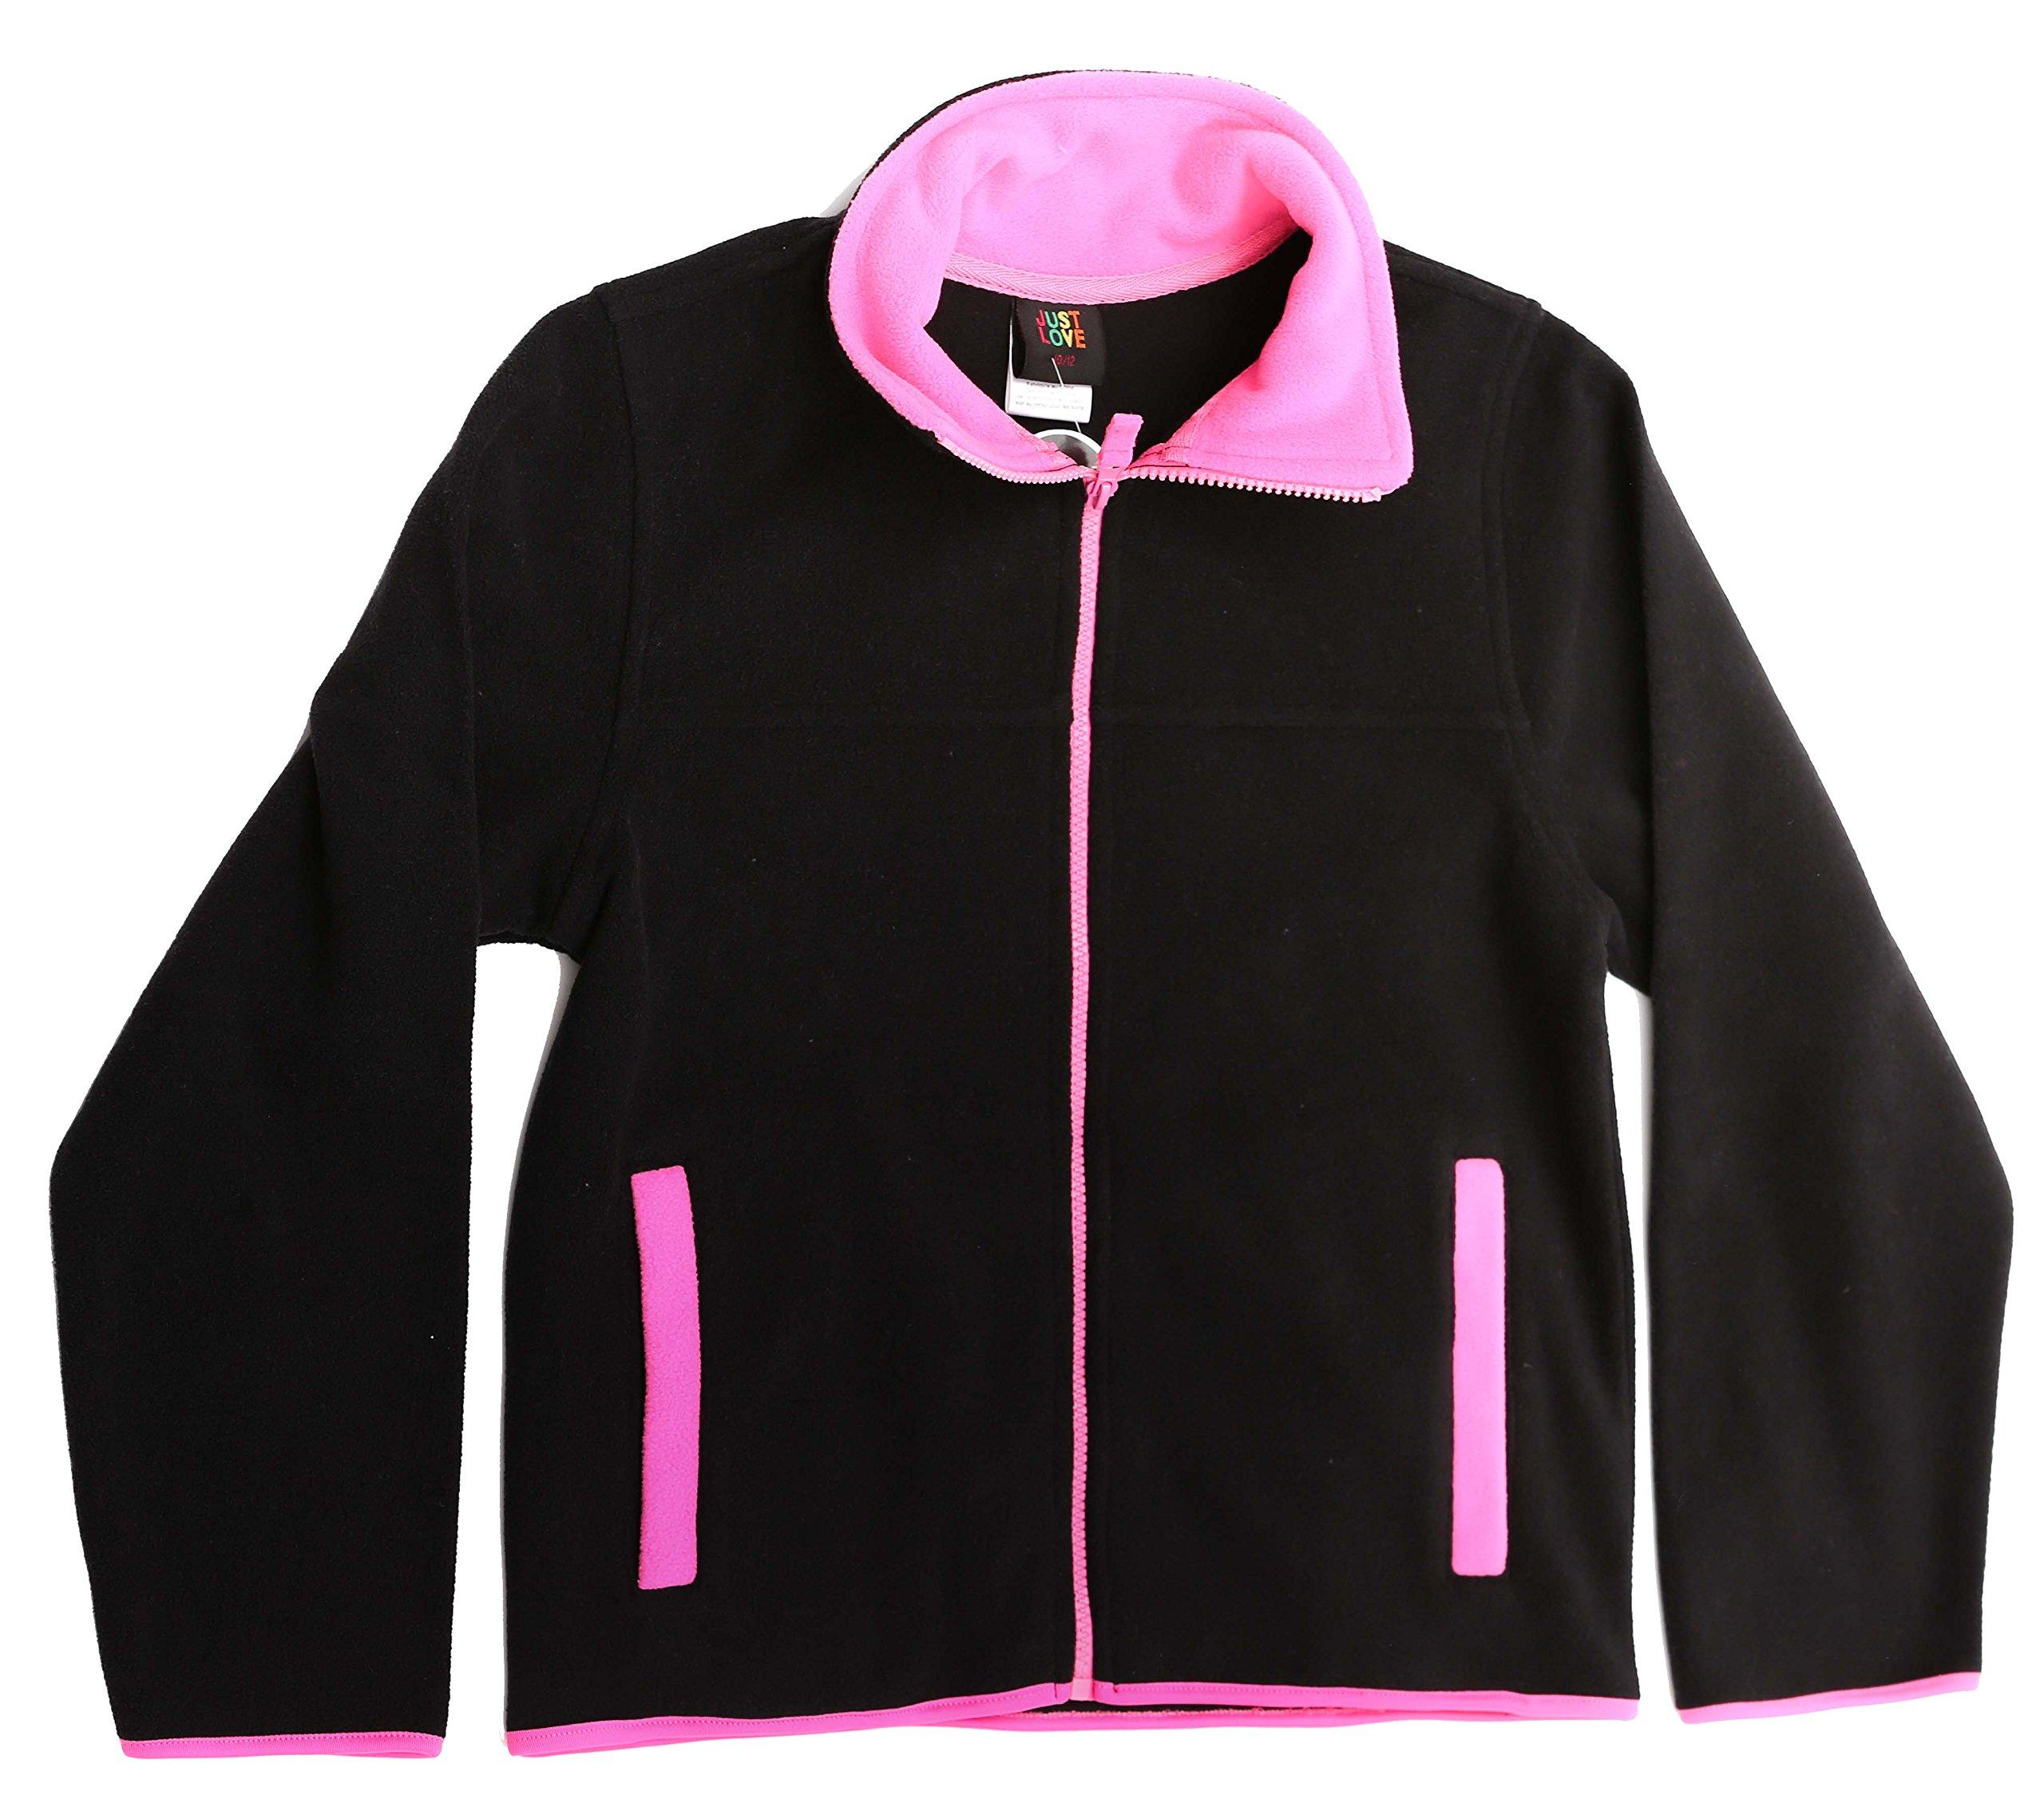 Just Love 98503-BLK-6-6X Solid Polar Fleece Girls Jacket